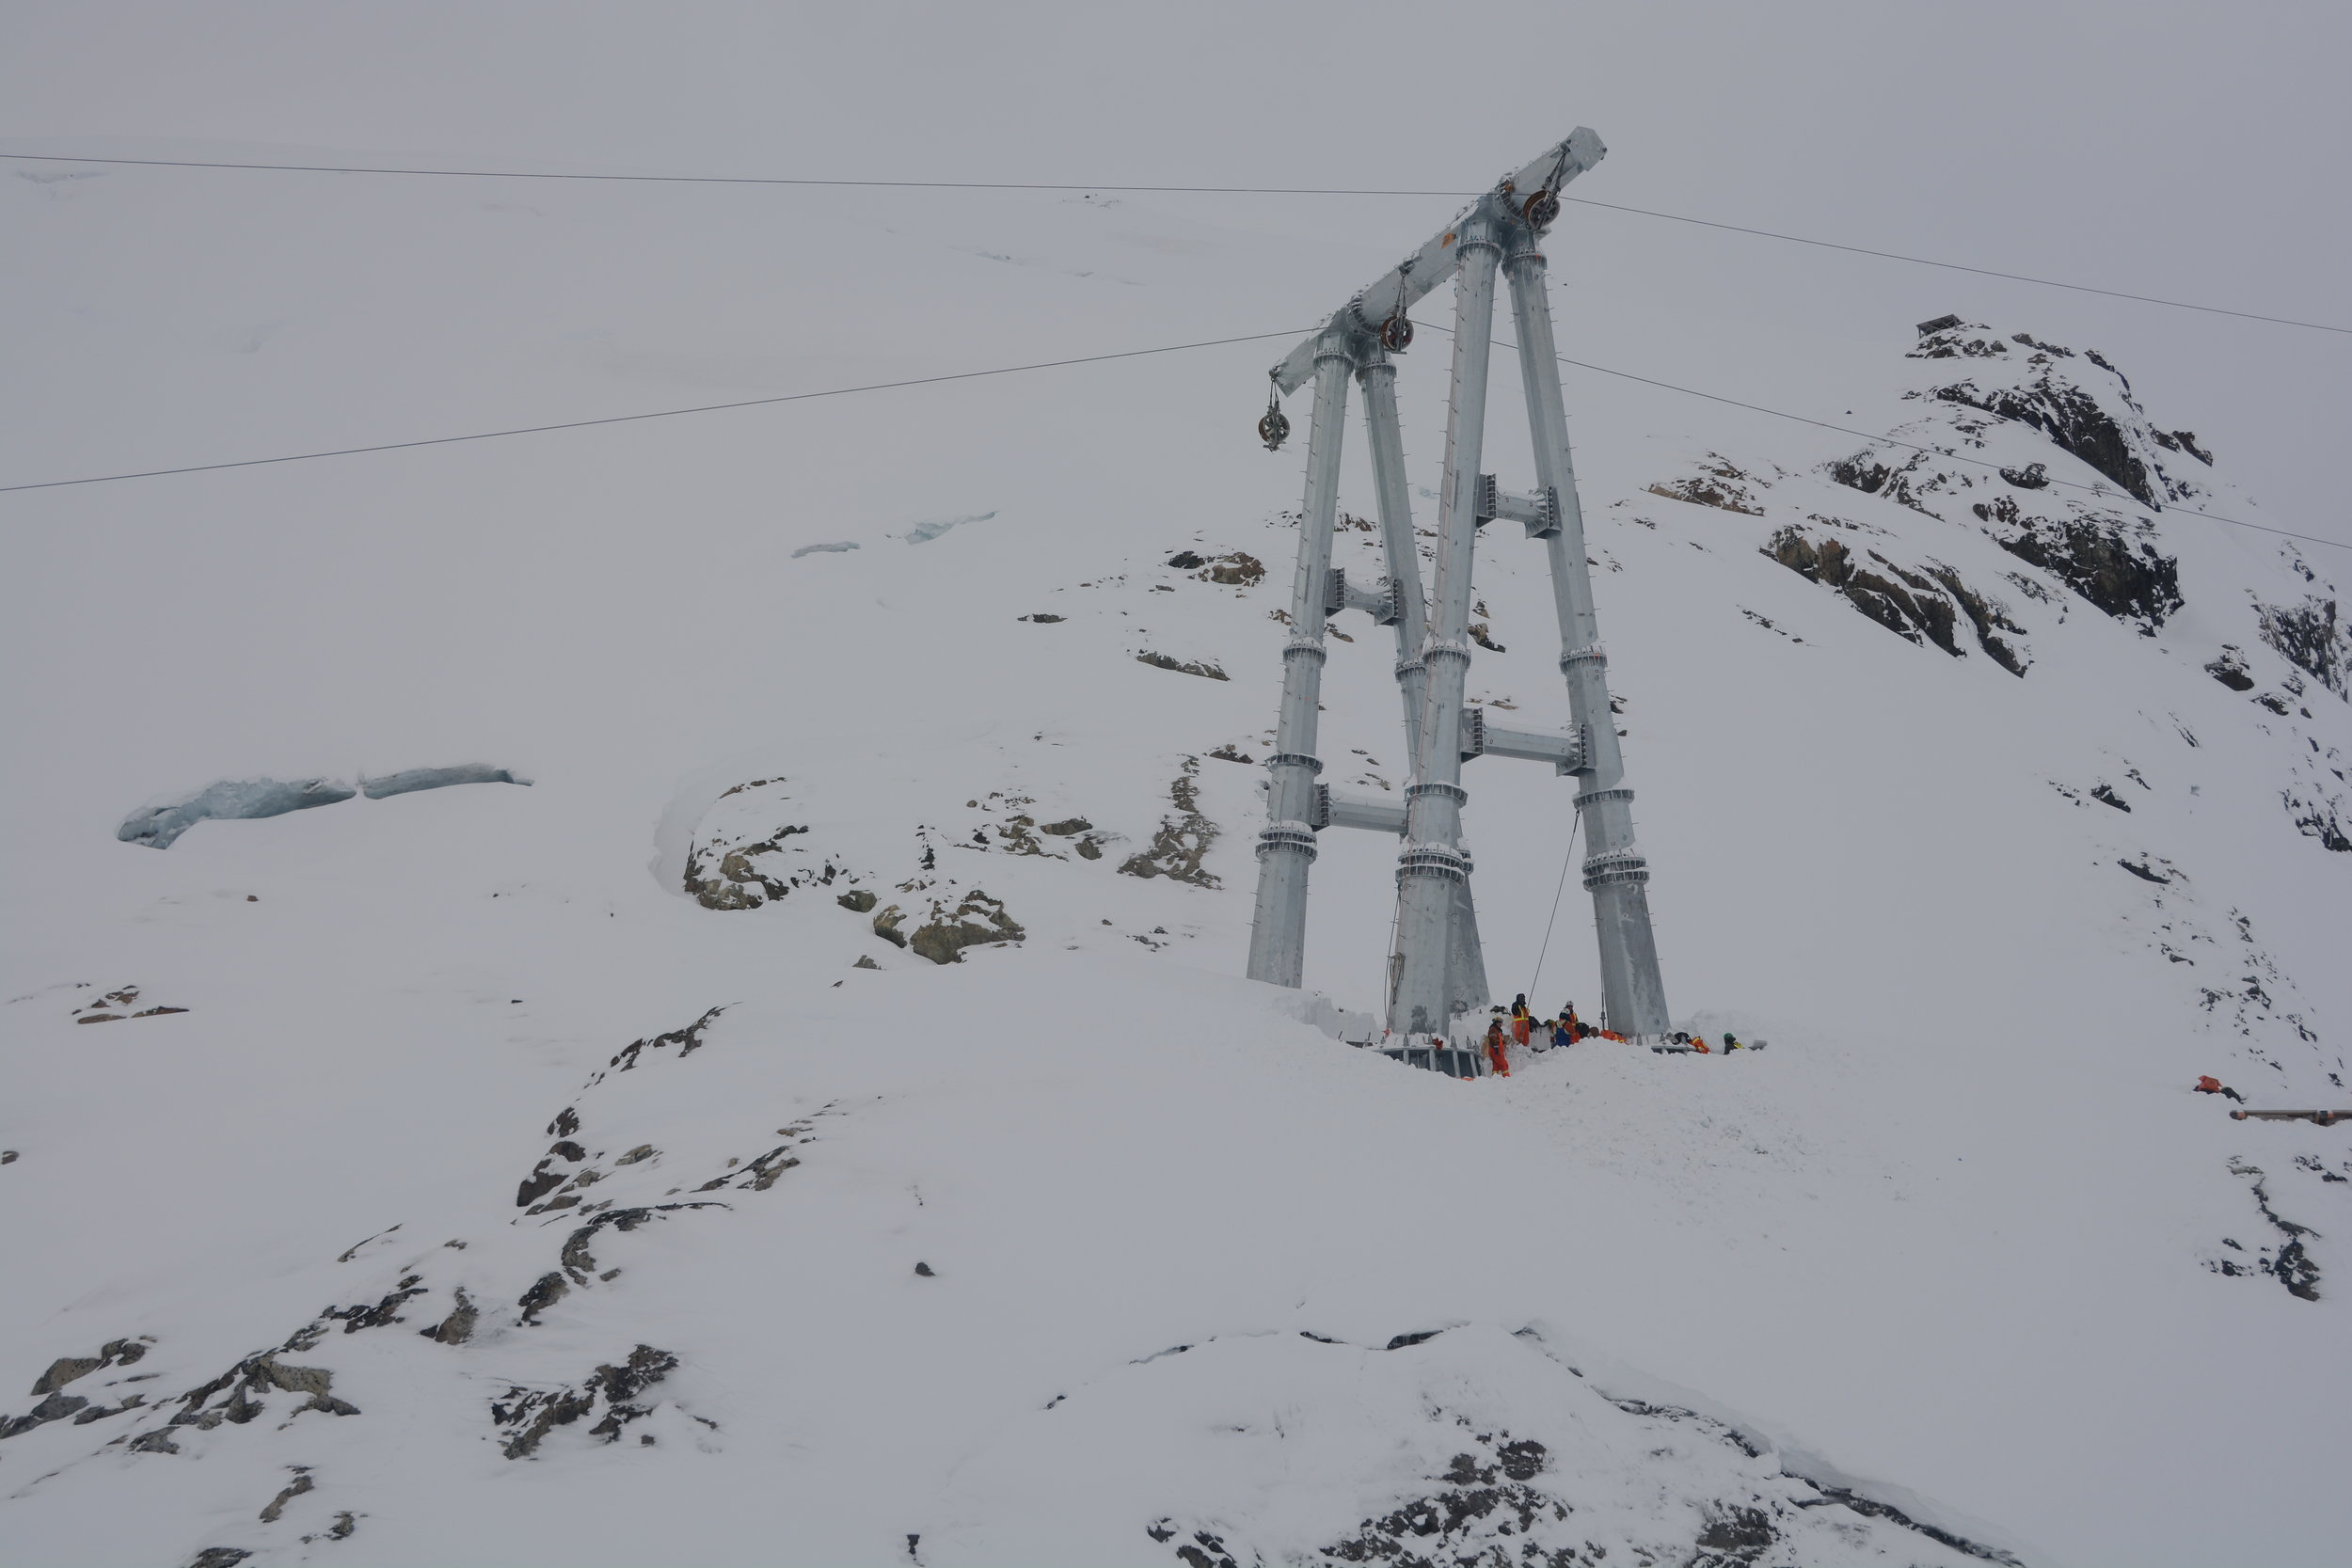 Snow Creep and Glide Engineering